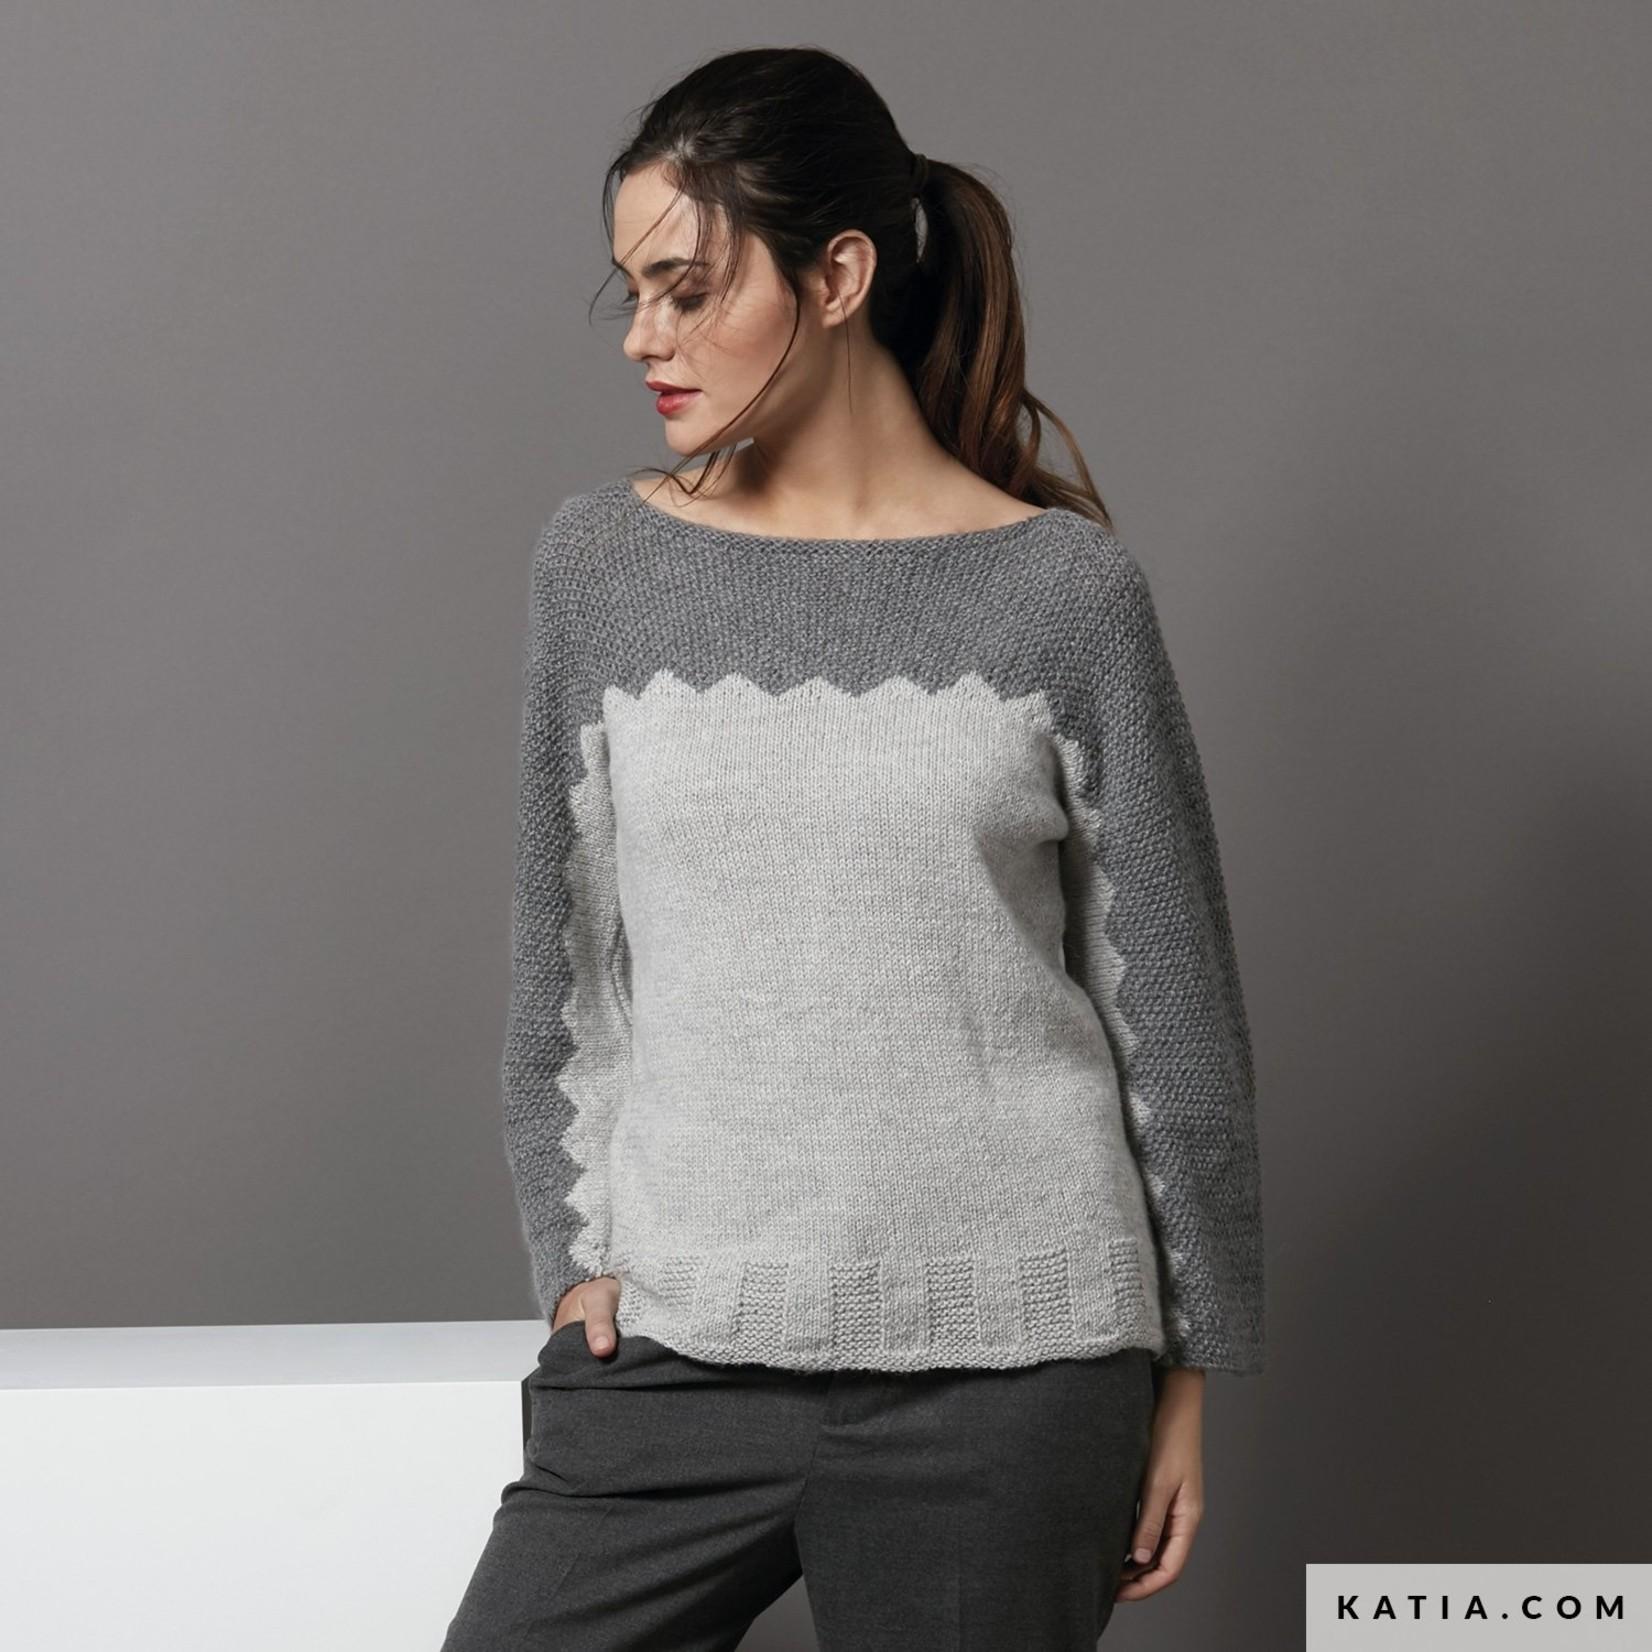 Katia Baby Alpaca 100% - kleur 519 - Jeans - 50 gr. = 125 m. - 100% Baby Alpaca